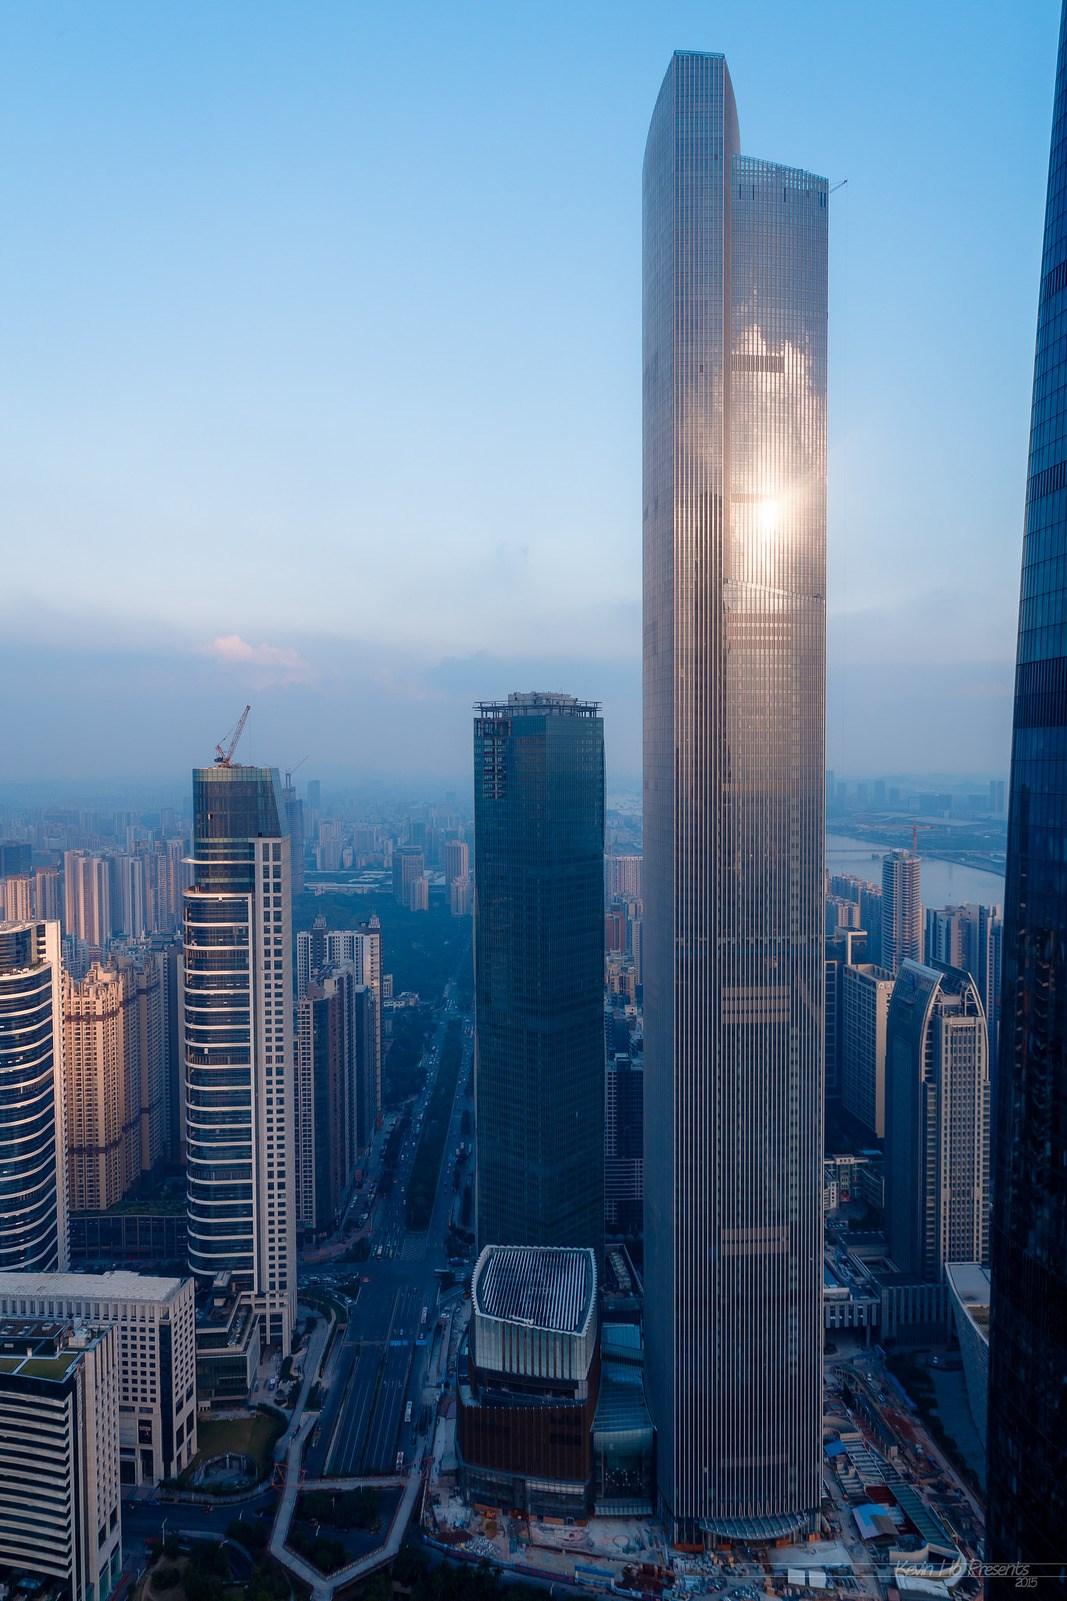 Guangzhou Ctf Finance Centre Megaconstrucciones Extreme